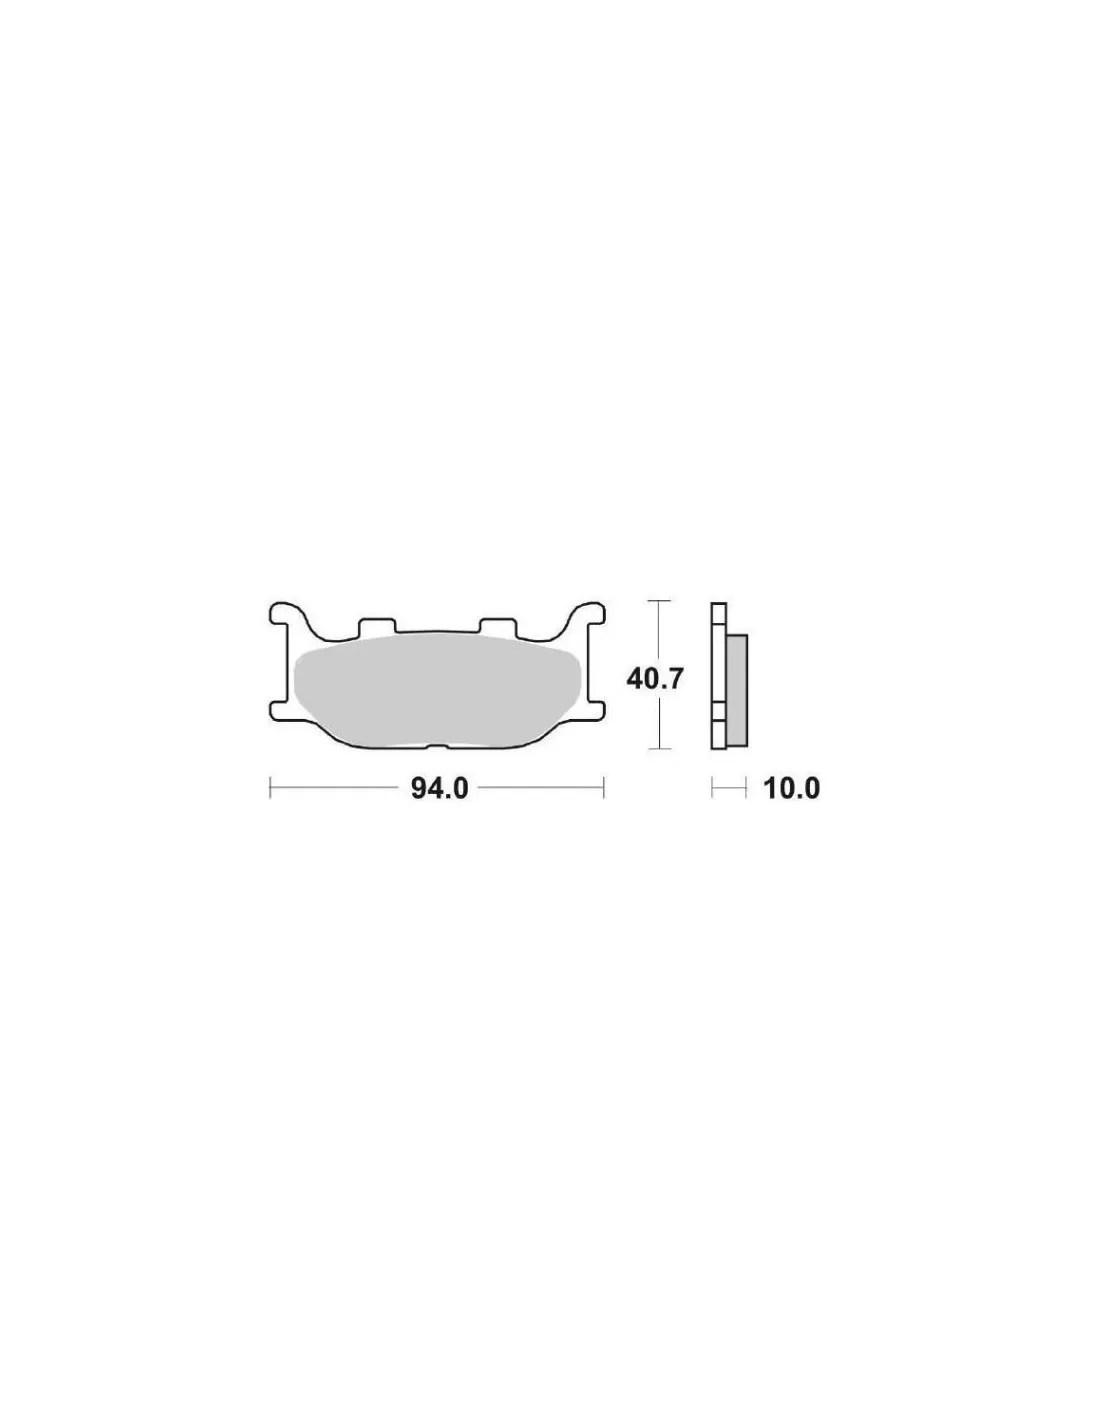 hight resolution of yamaha majesty wiring diagram wiring diagram libraries rh w6 mo stein de yamaha yp 125 majesty